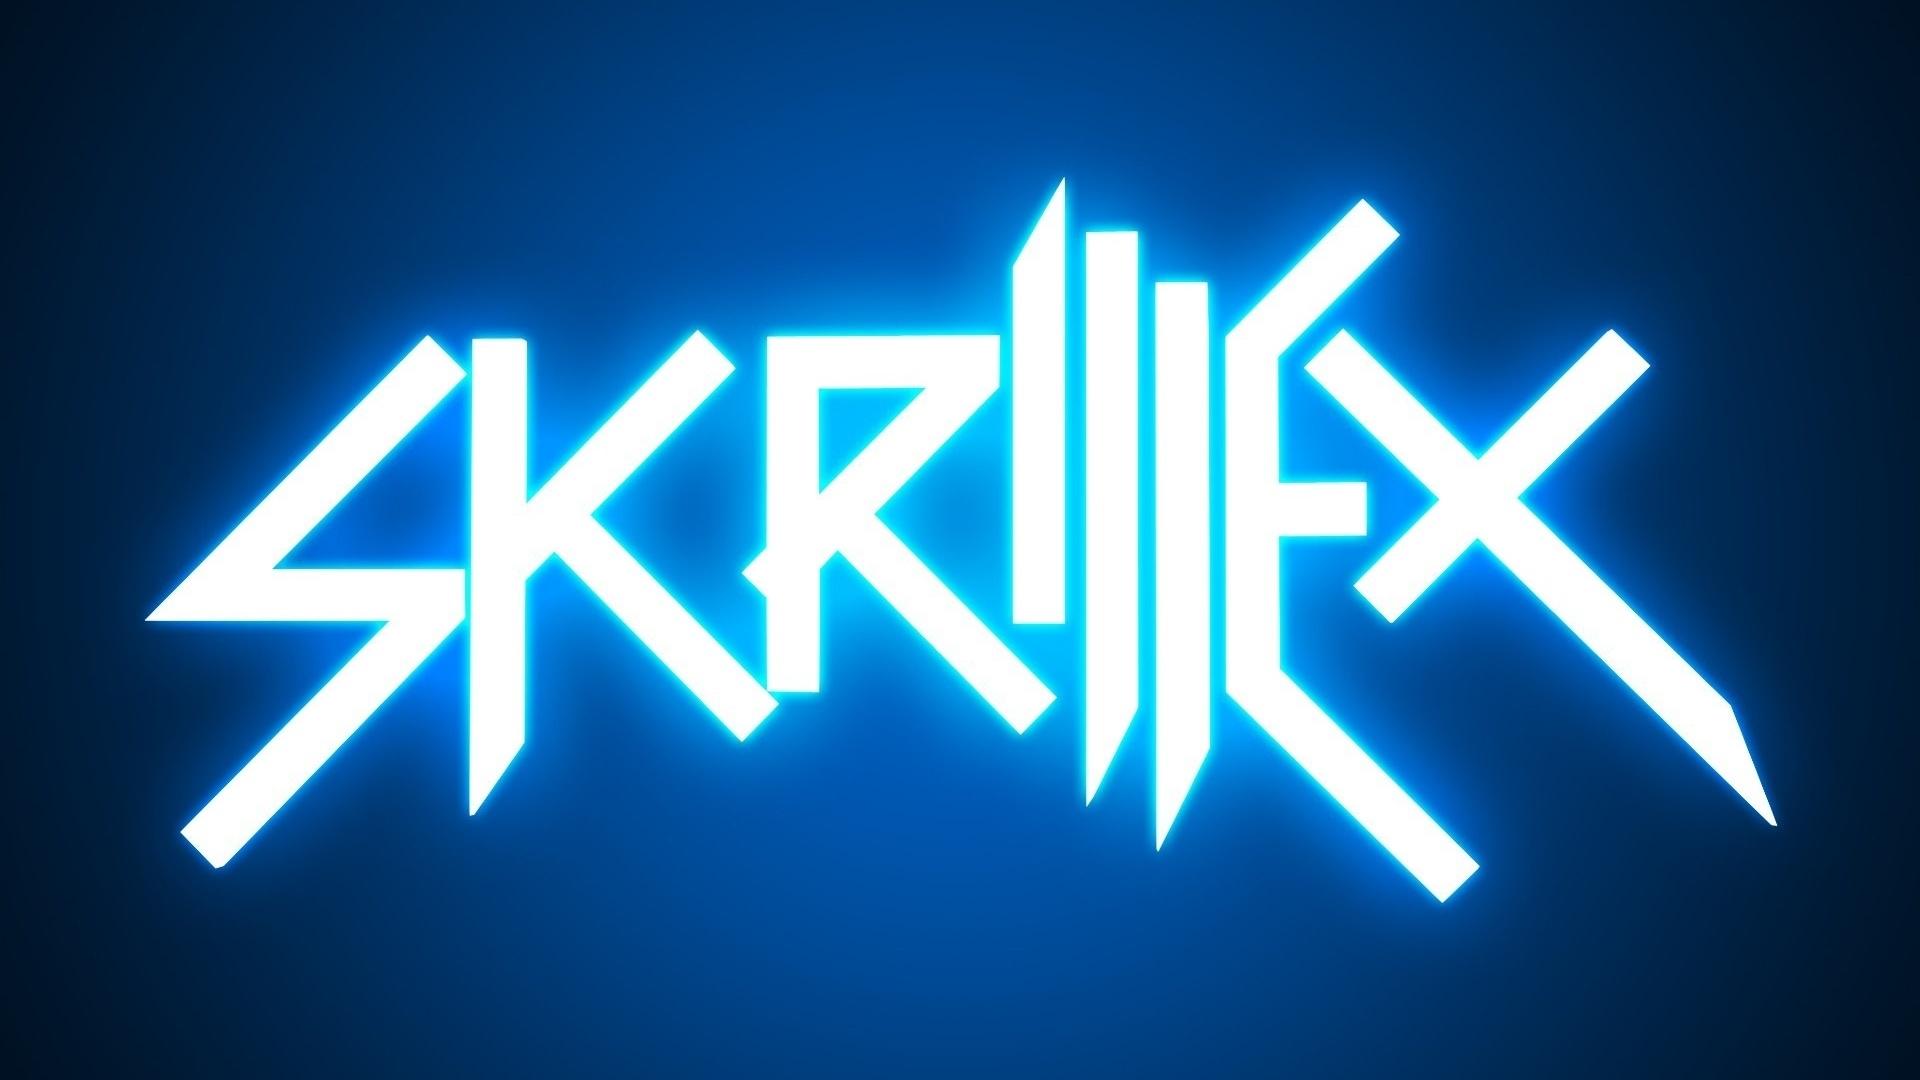 Skrillex Wallpaper Free Download